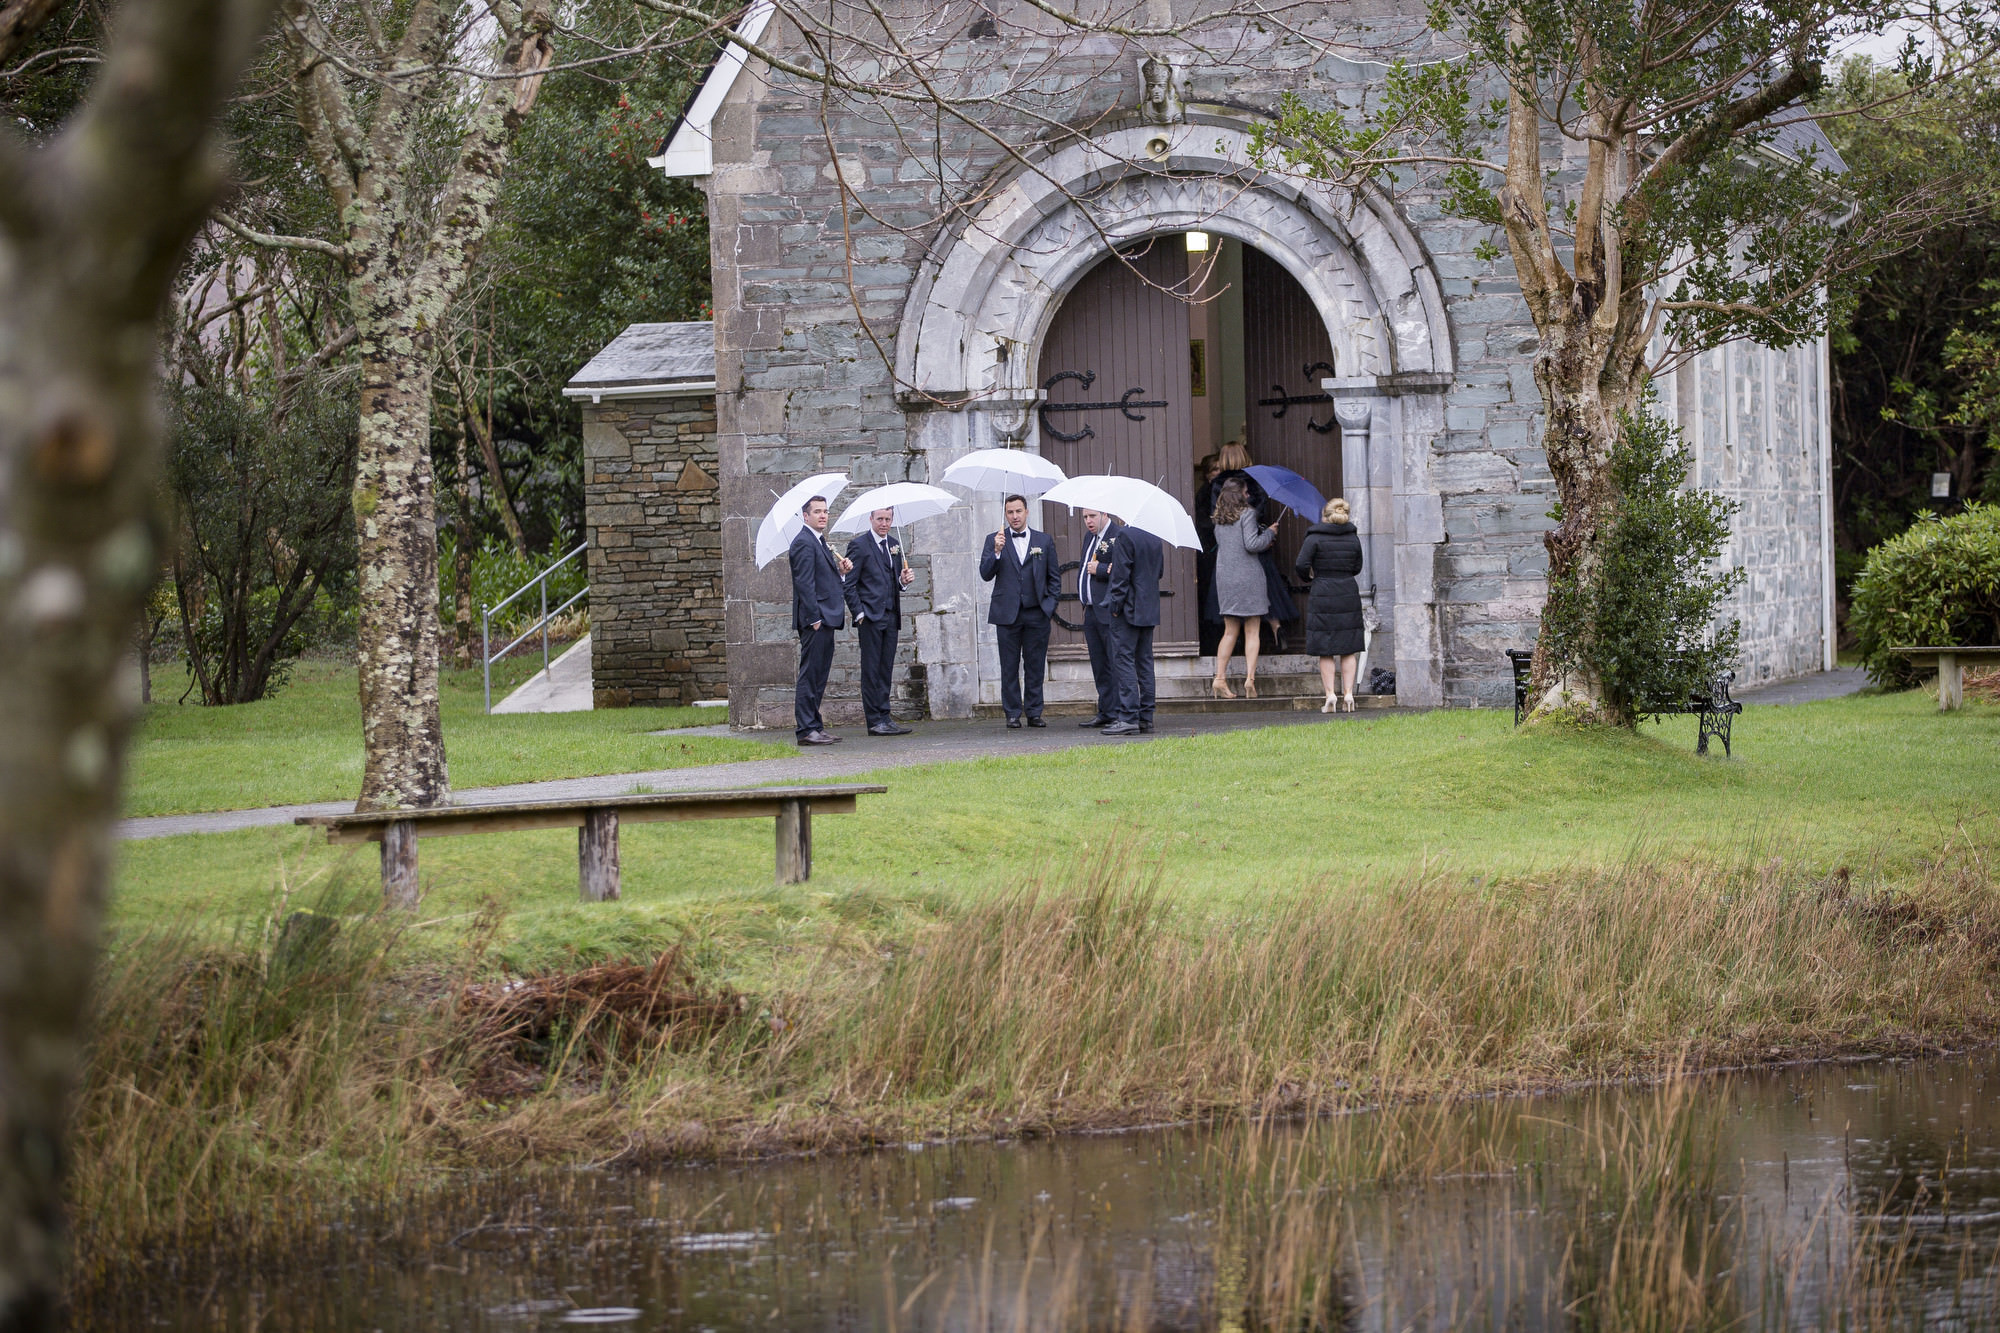 muckross_park_hotel_grougane_barra_wedding_photographer_goldenmoments_030.jpg